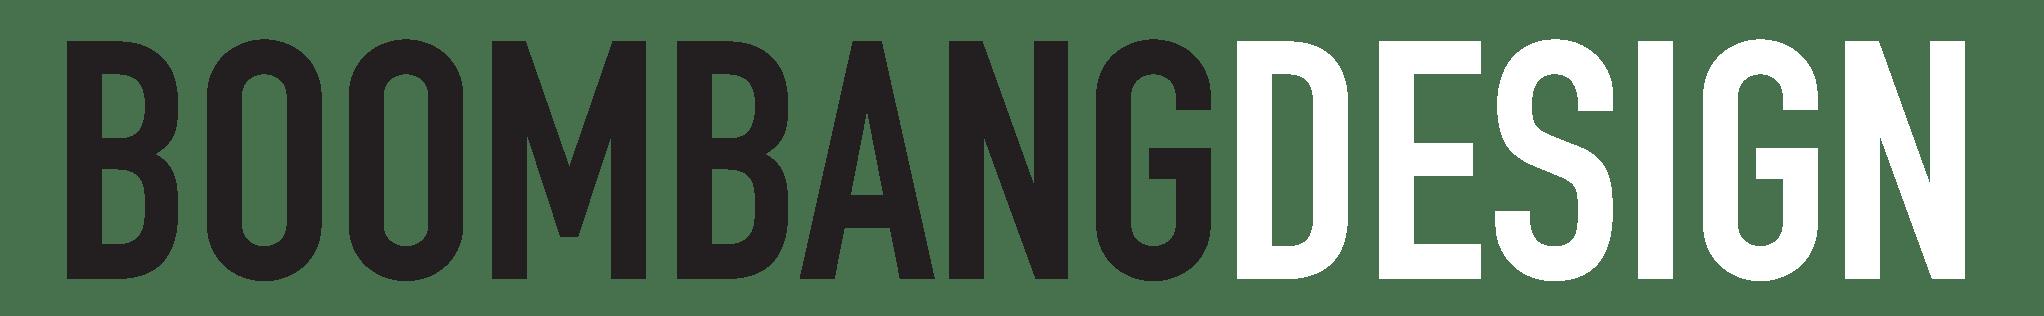 BoombangDesign logo soloscritta